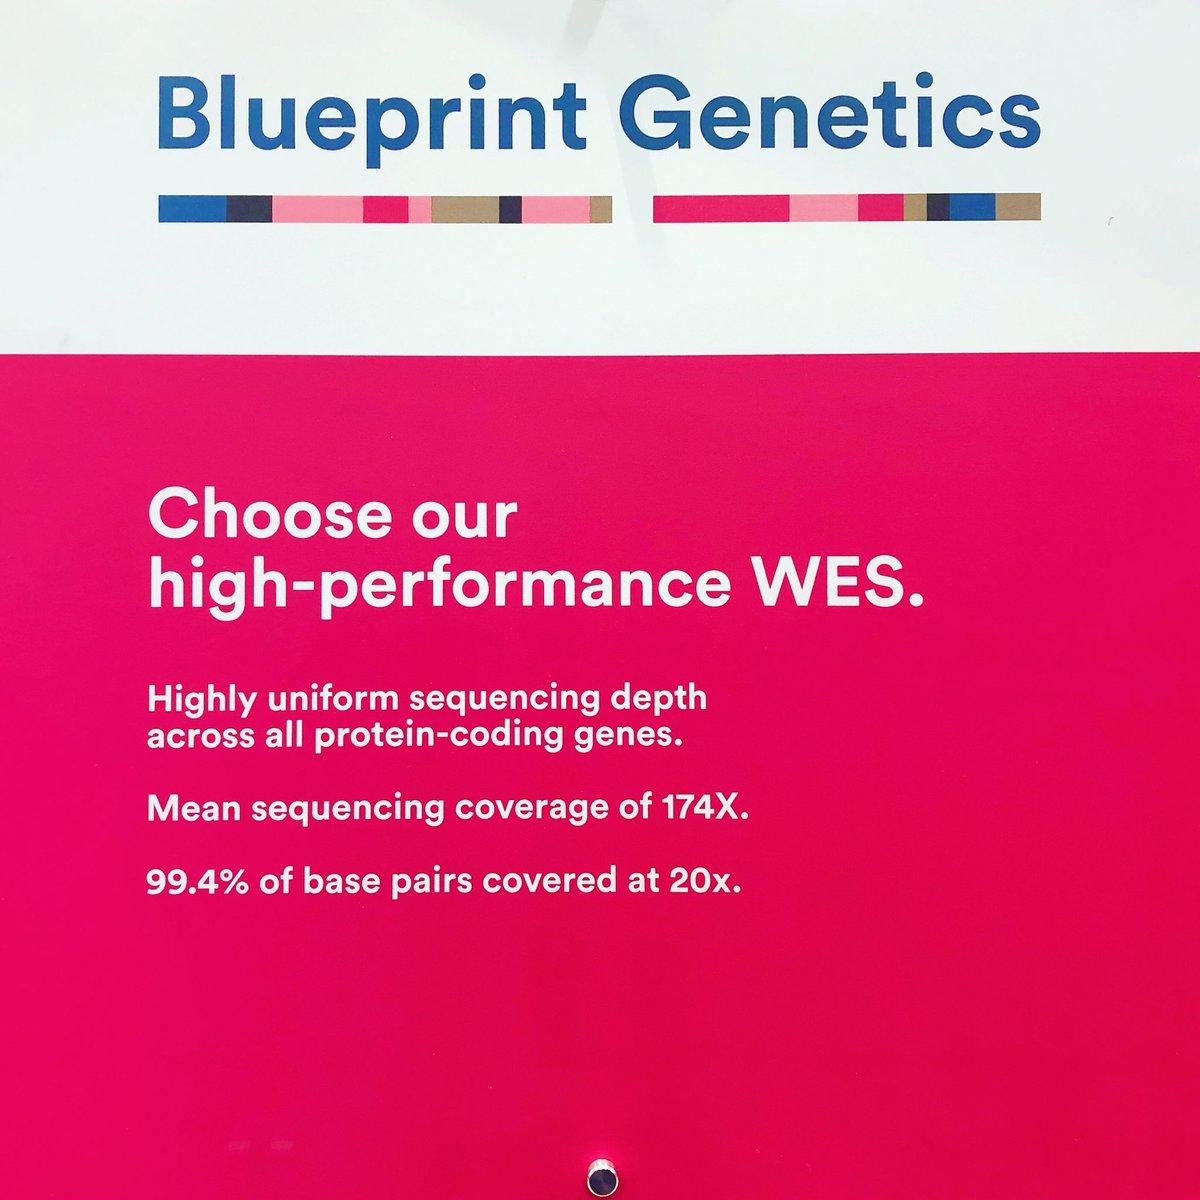 Blueprint genetics bpgenetics twitter 0 replies 0 retweets 5 likes malvernweather Image collections